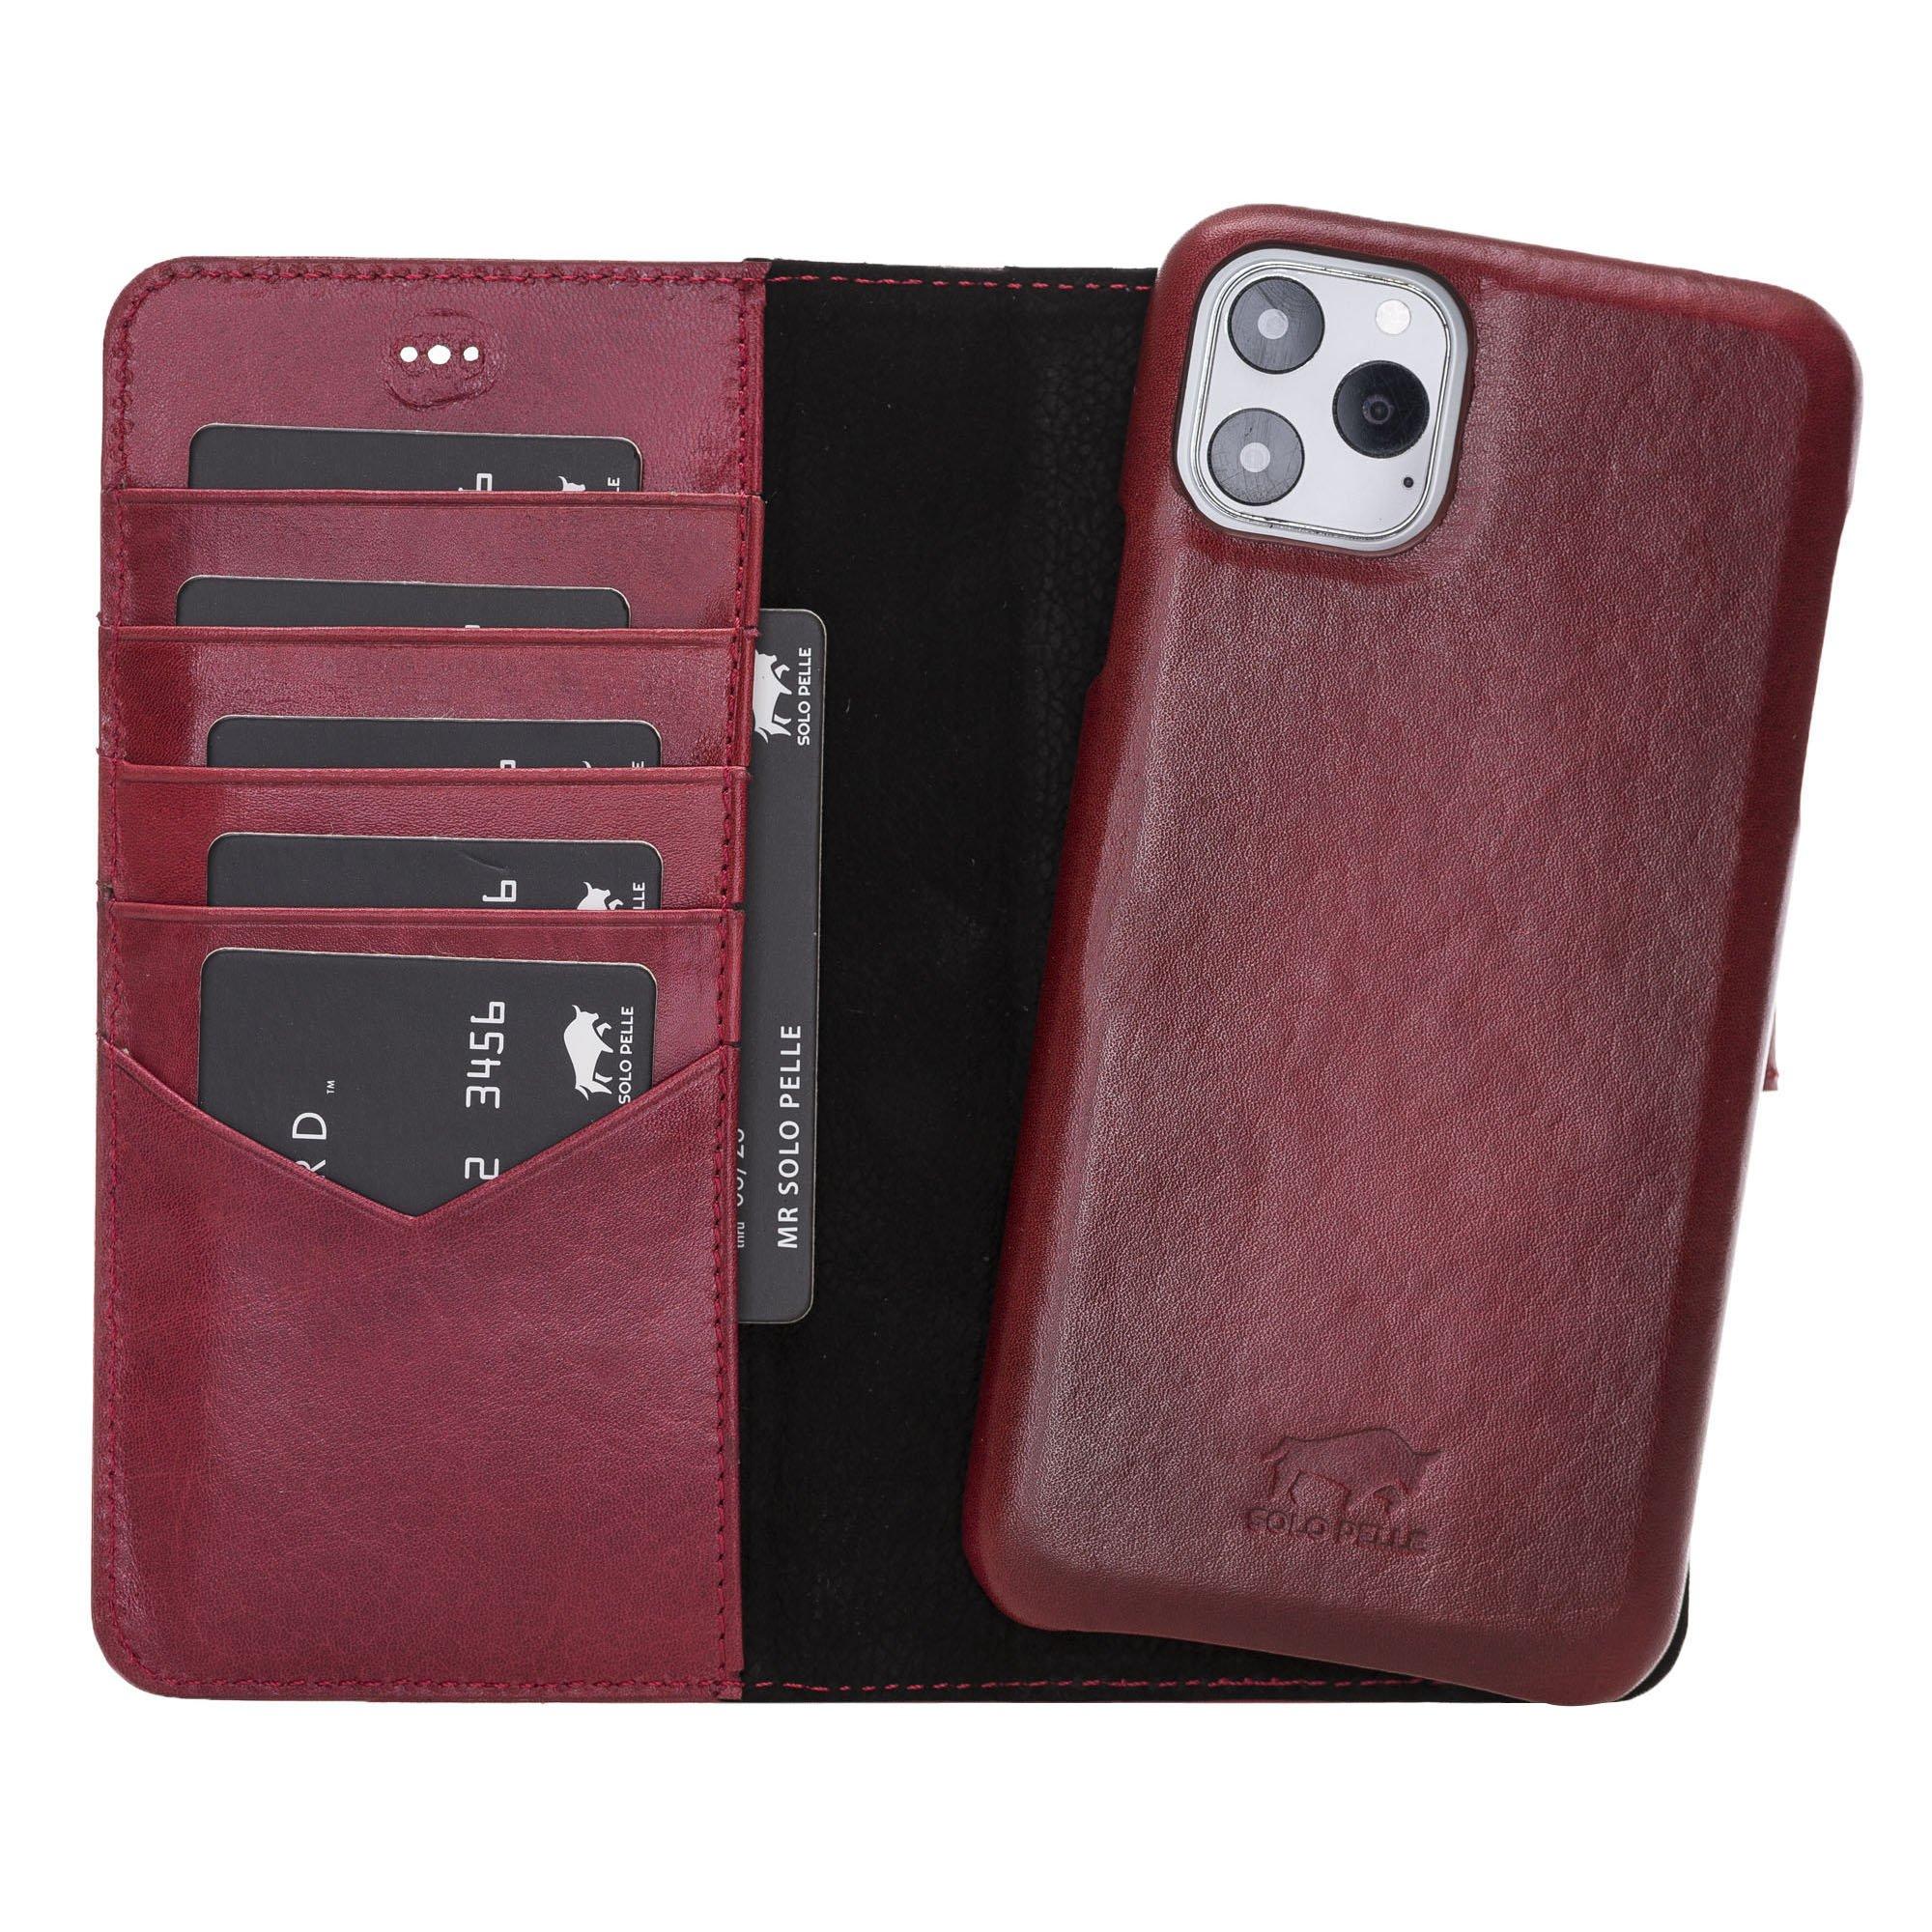 Lederhülle kompatibel für iPhone 11 Pro Max 6.5 Zoll abnehmbare Hülle (2in1) inkl. Kartenfächer (Vollleder Rot Burned)